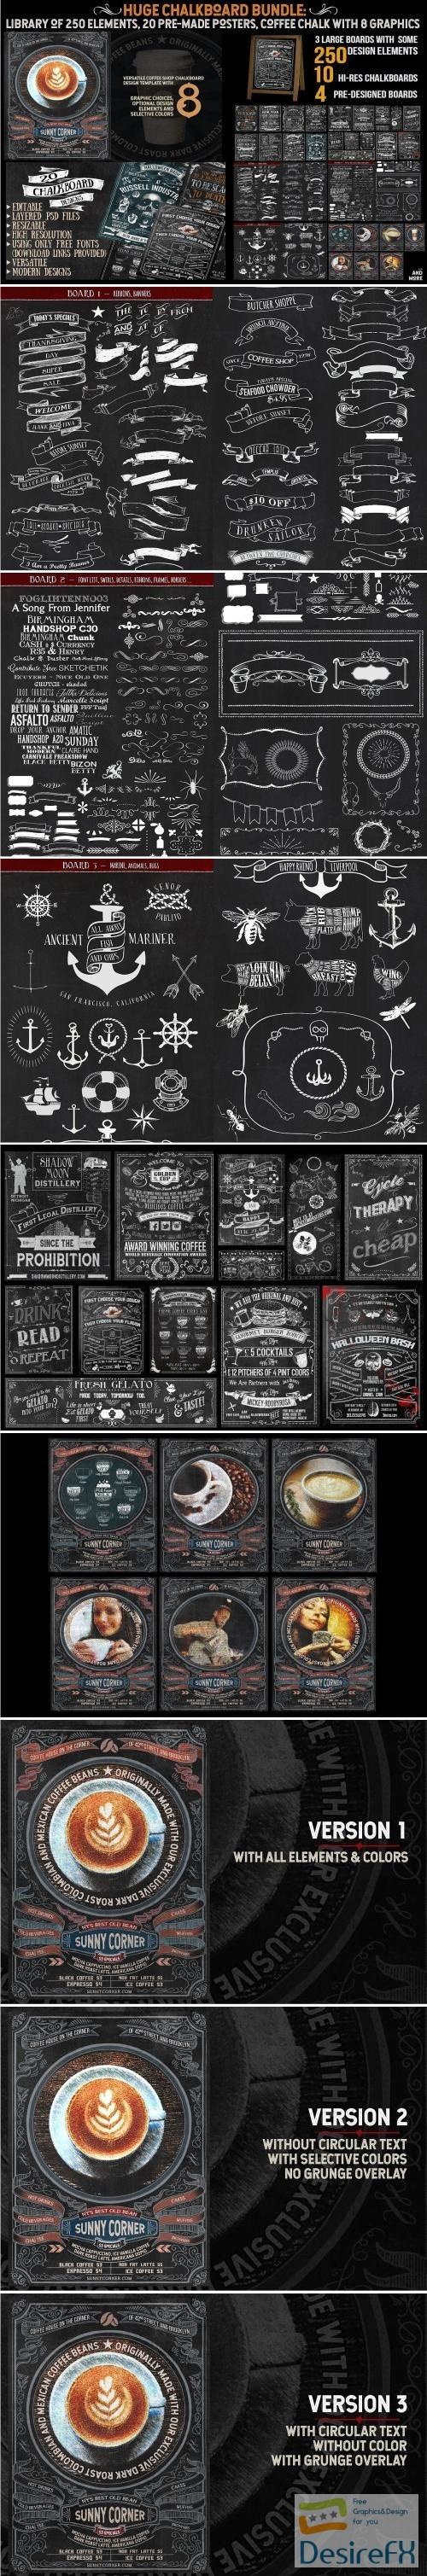 photoshop - Ultimate Chalkboard Mega Bundle - 2188216